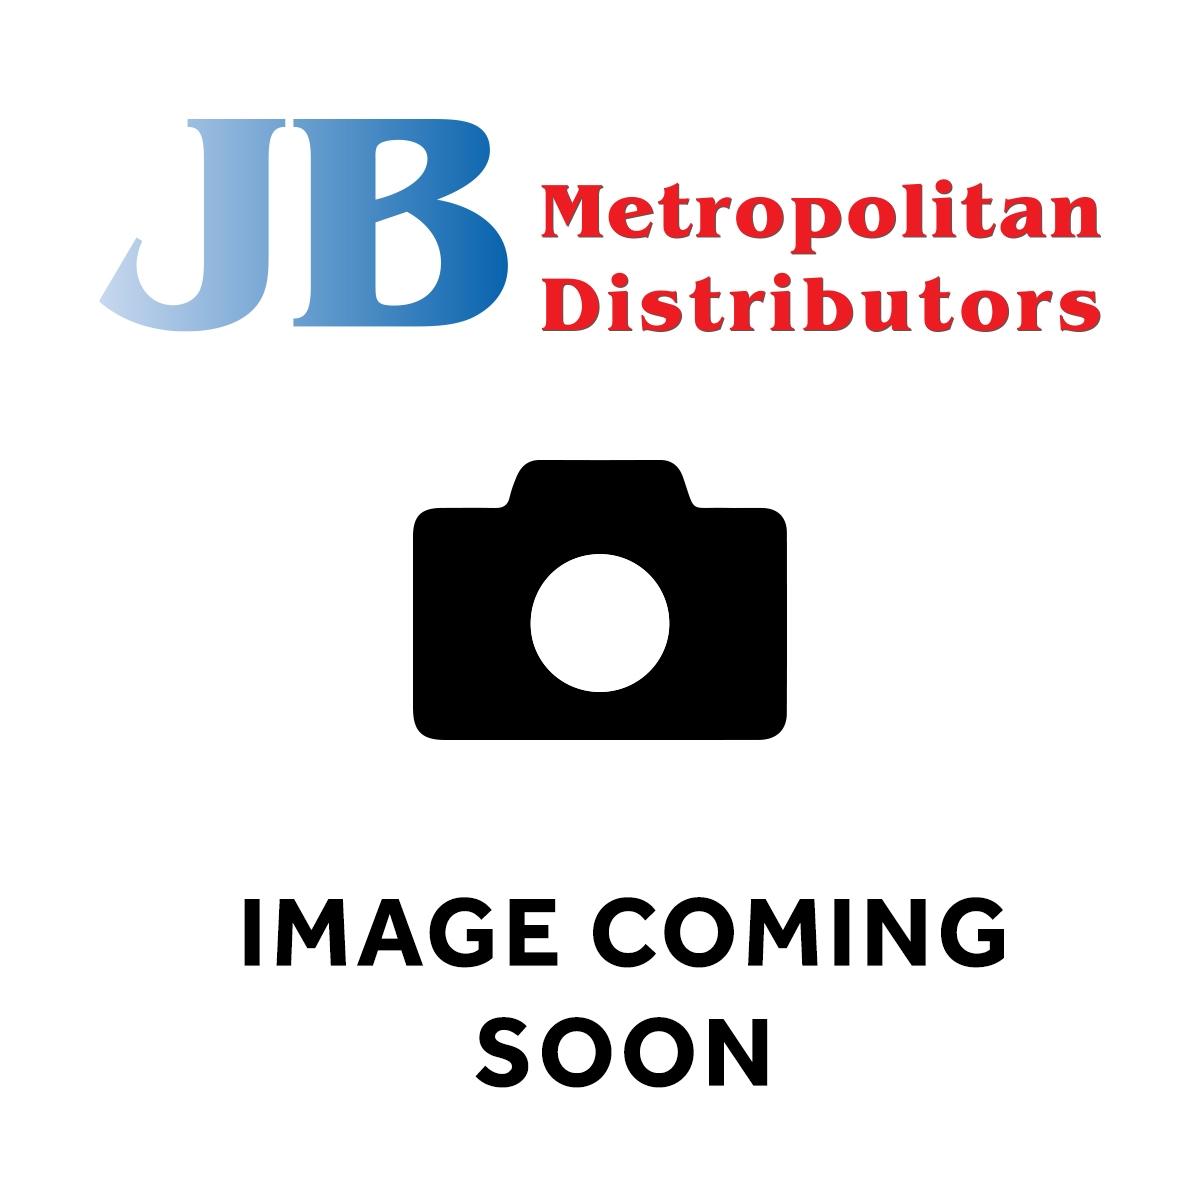 140G JONNY'S POPCORN SWEET SALT